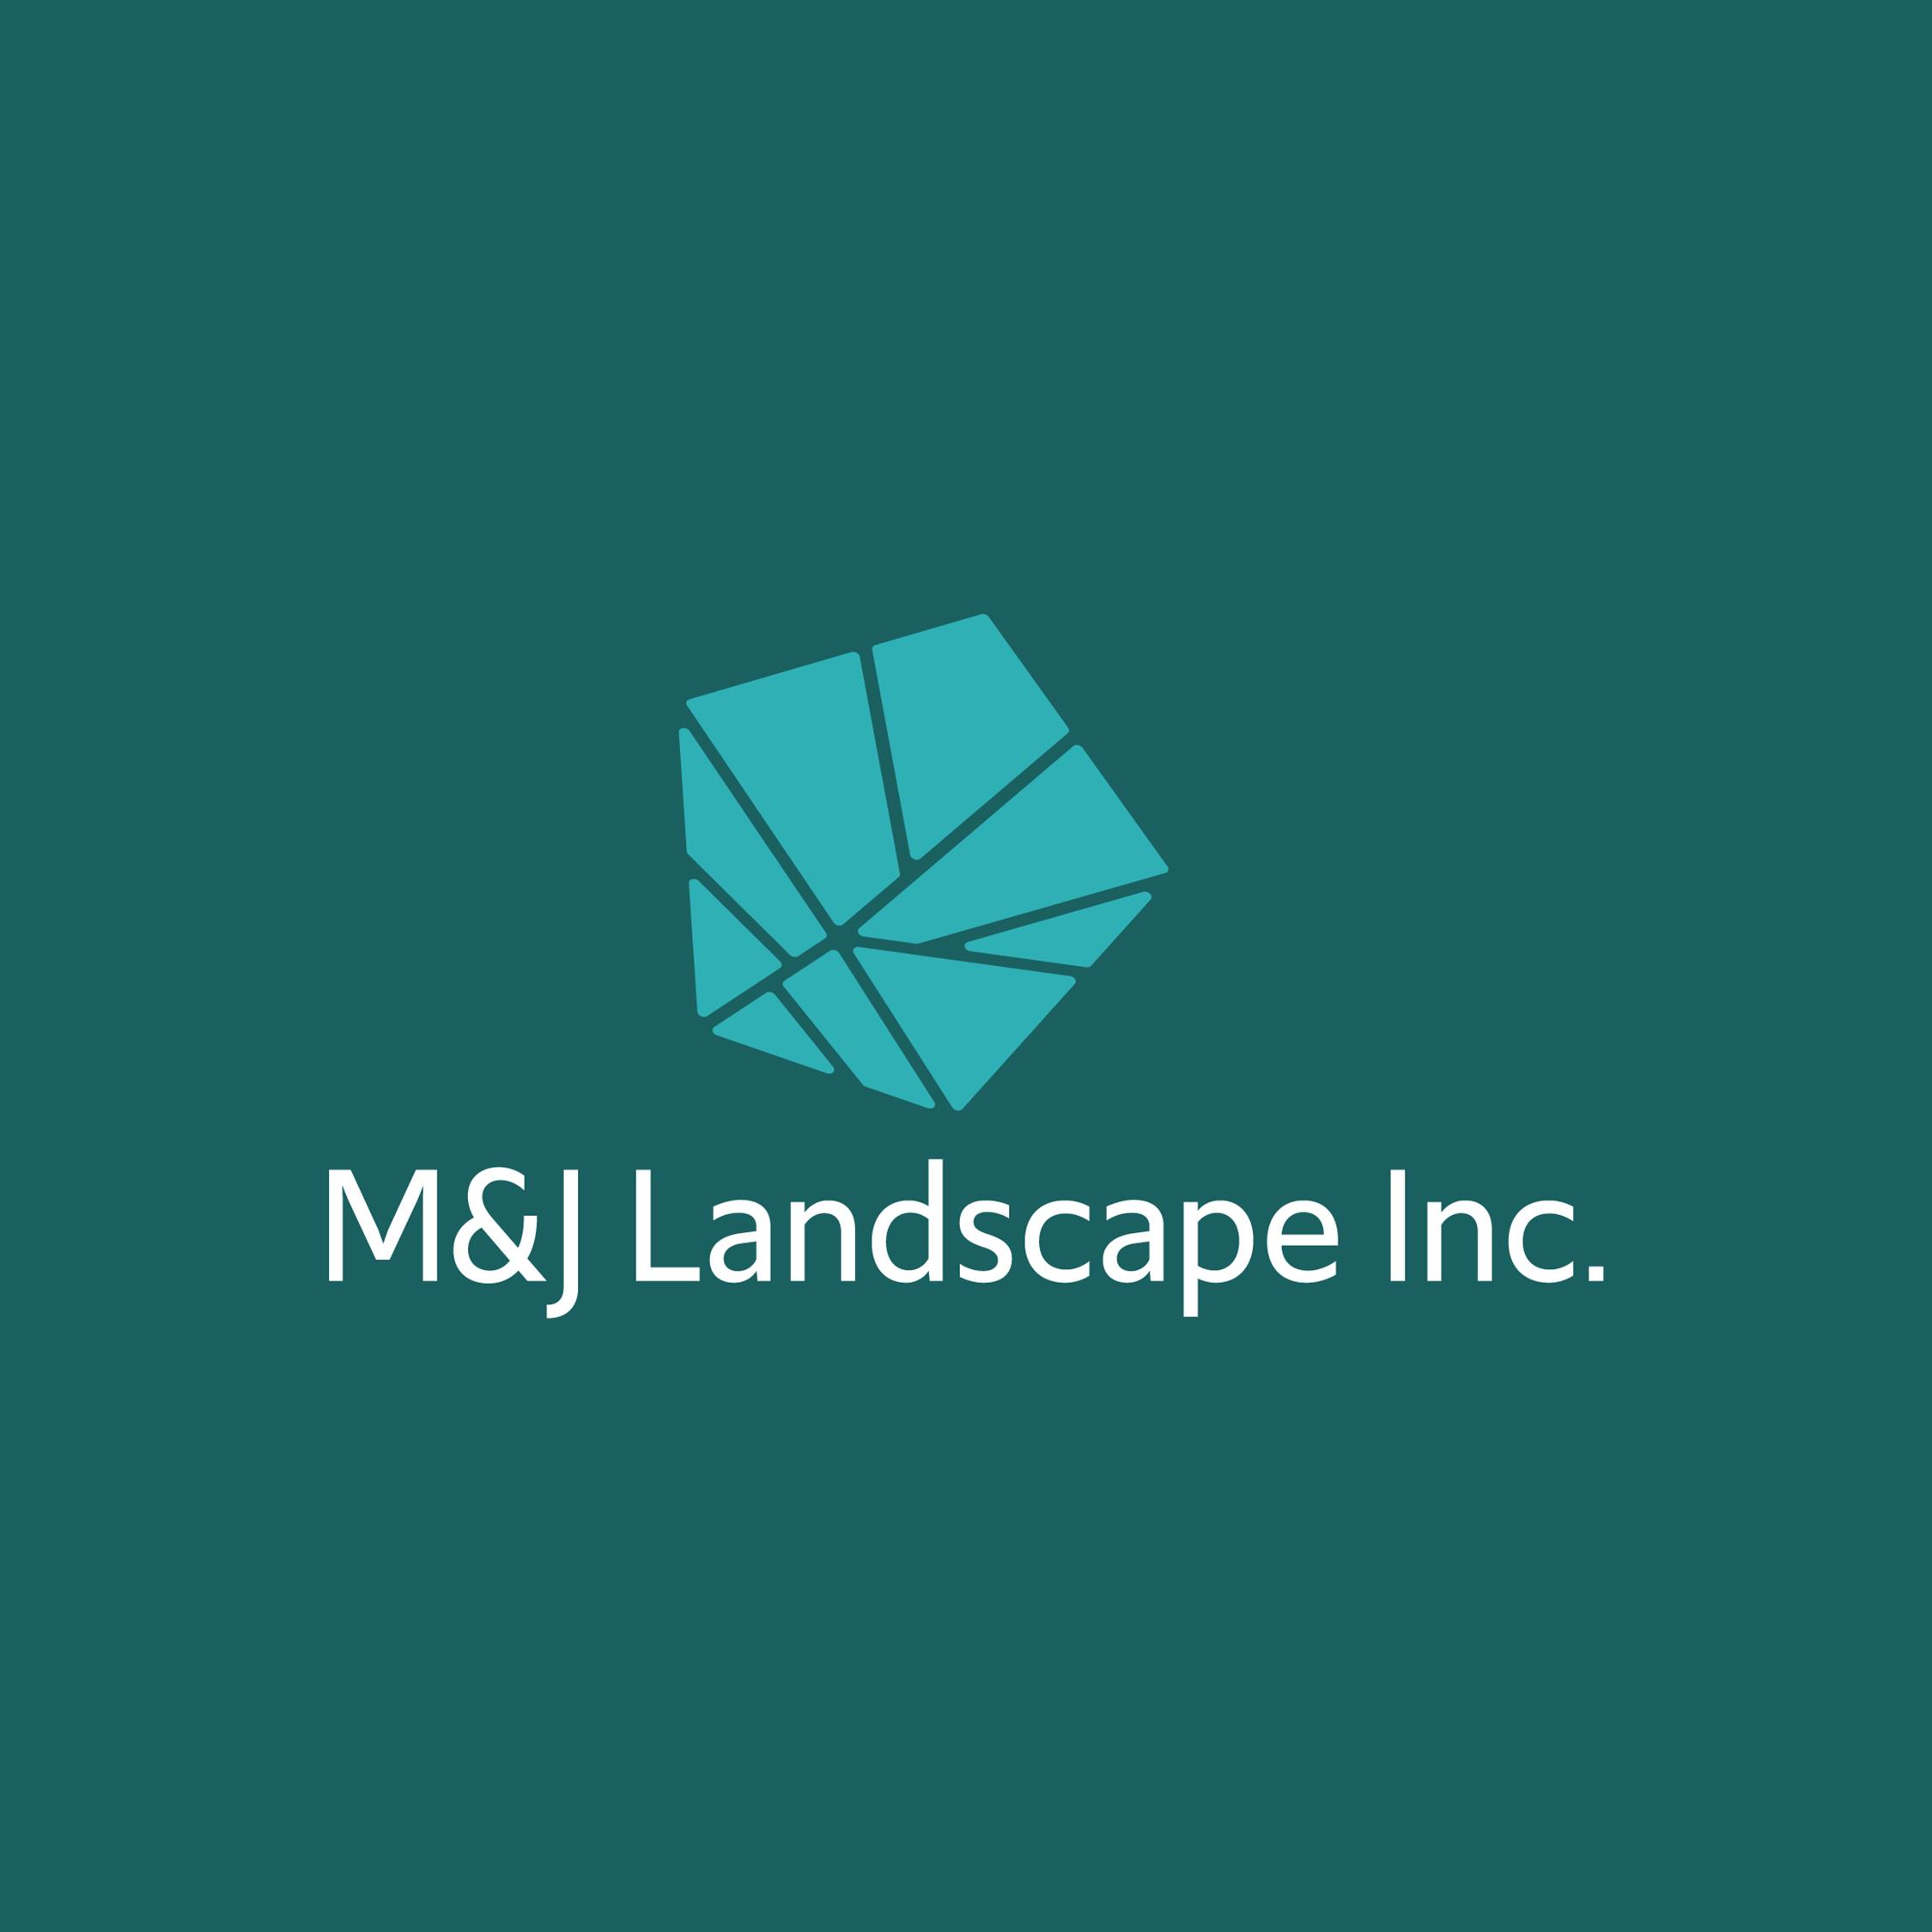 M&J Landscape